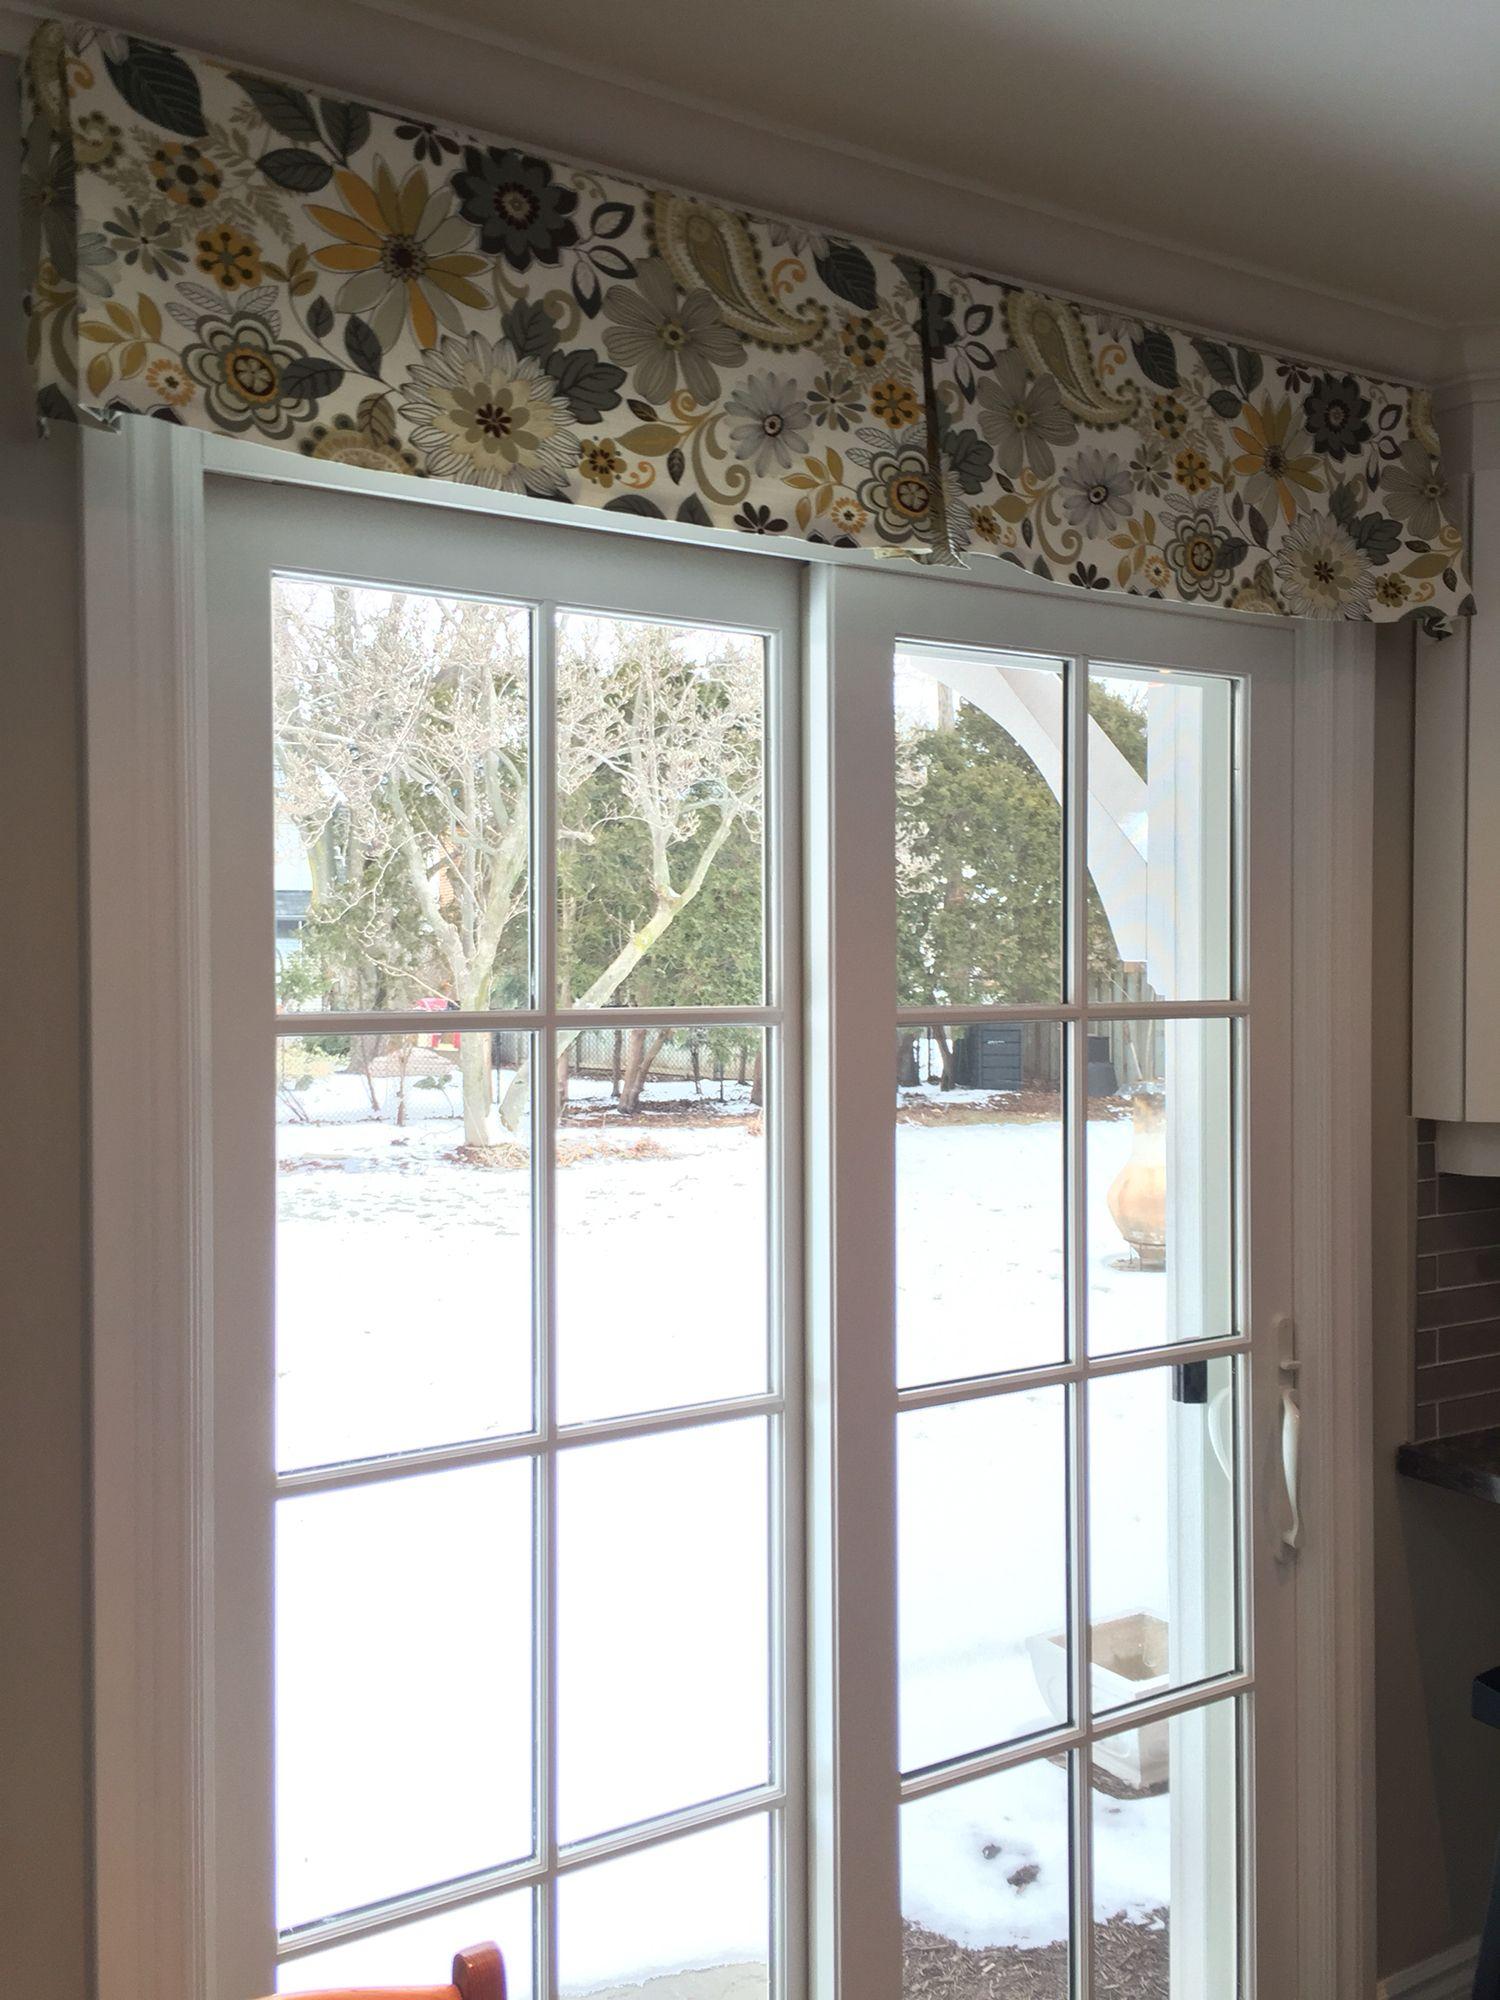 Patio Door Window Treatment Using A Simple Decorative Box